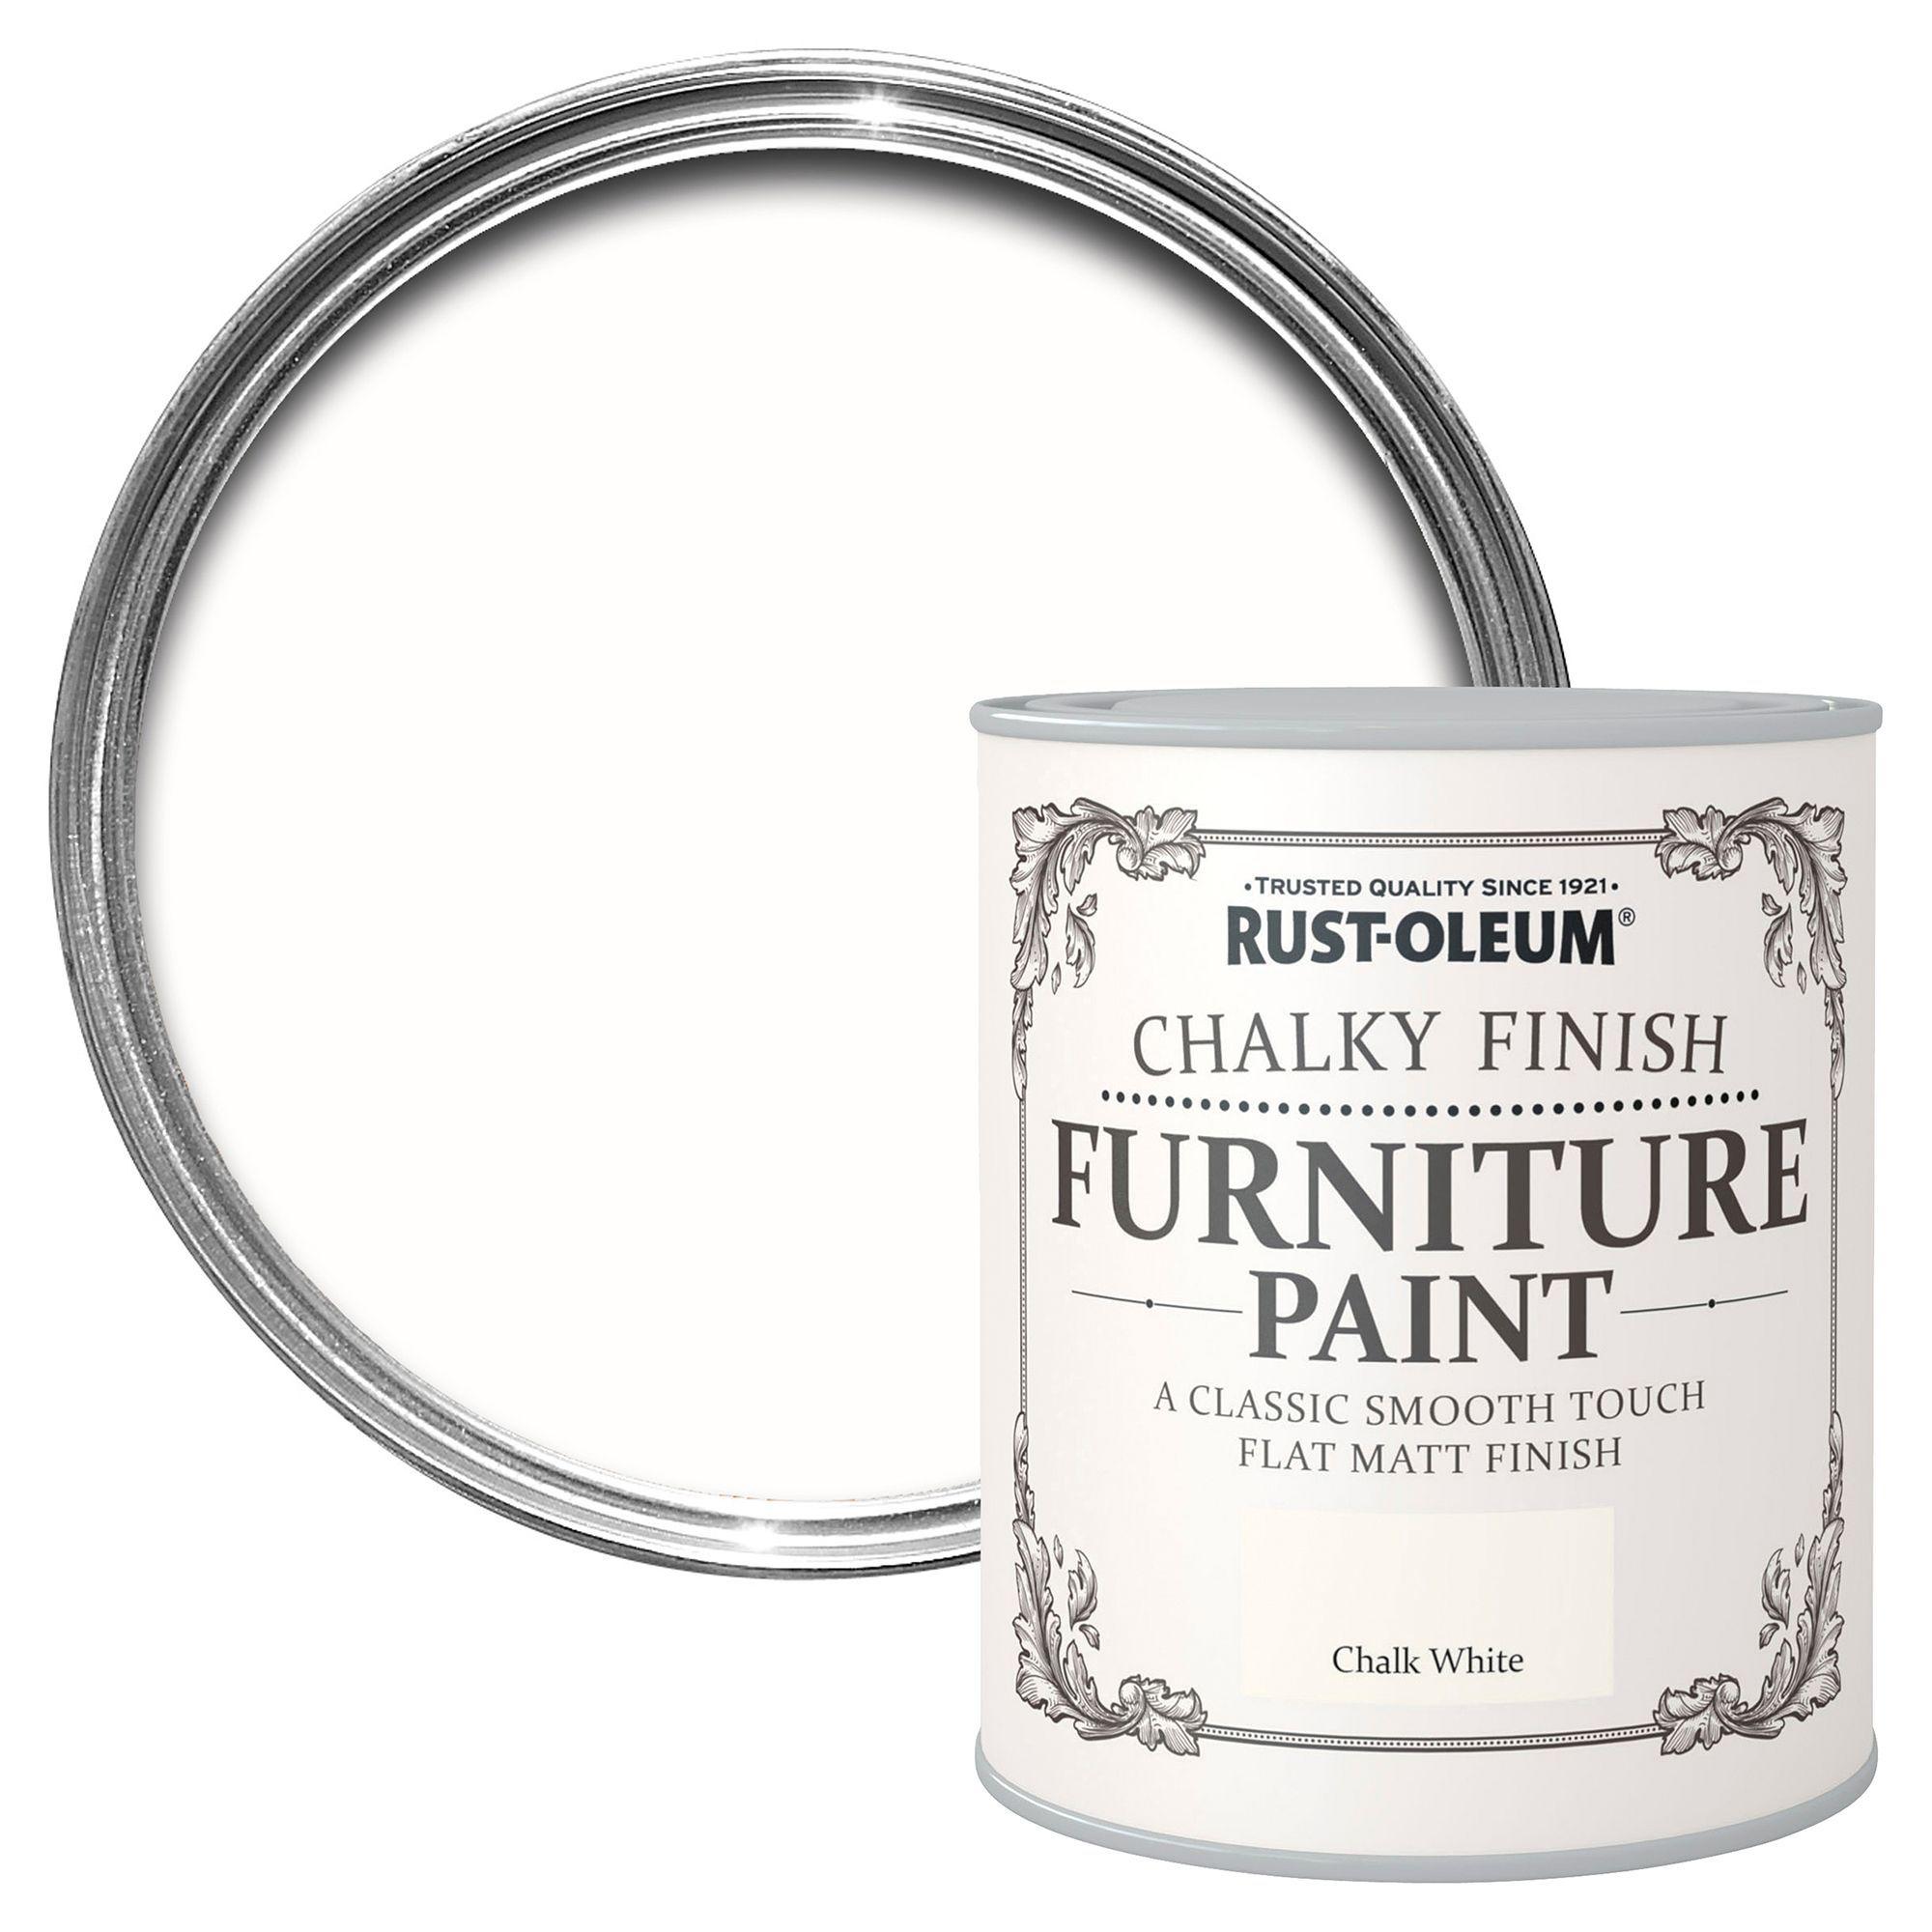 Rust-oleum Rust-oleum Chalk White Chalky Matt Furniture Paint 750 Ml